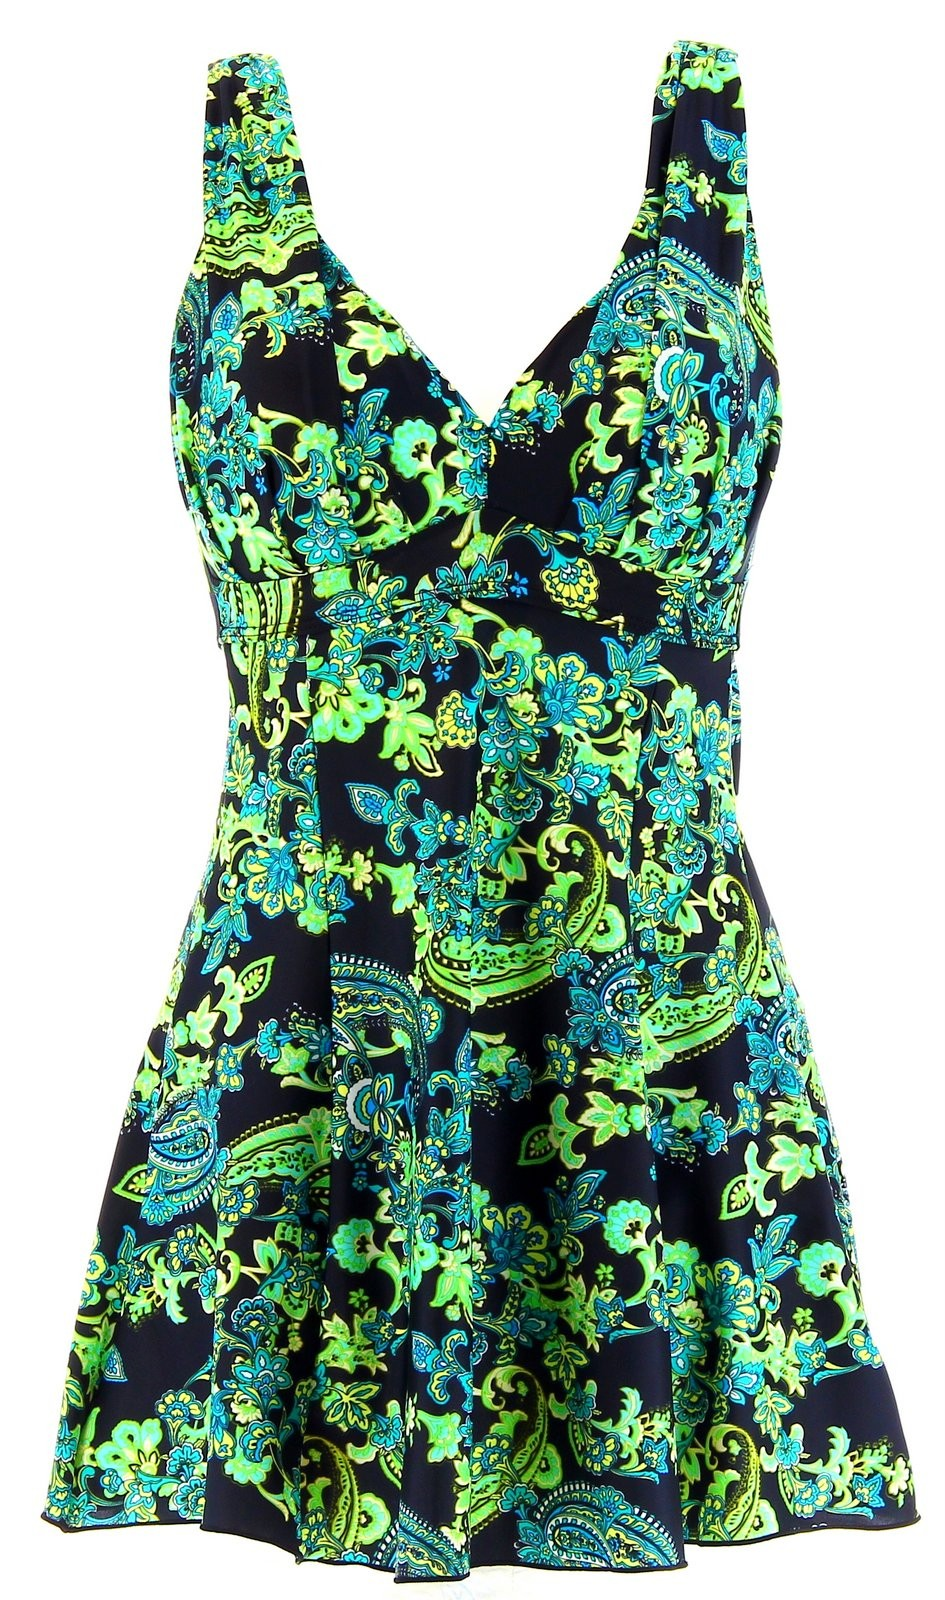 maillot de bain 1 pi ce robe jupette fleurs dalhia grande taille. Black Bedroom Furniture Sets. Home Design Ideas